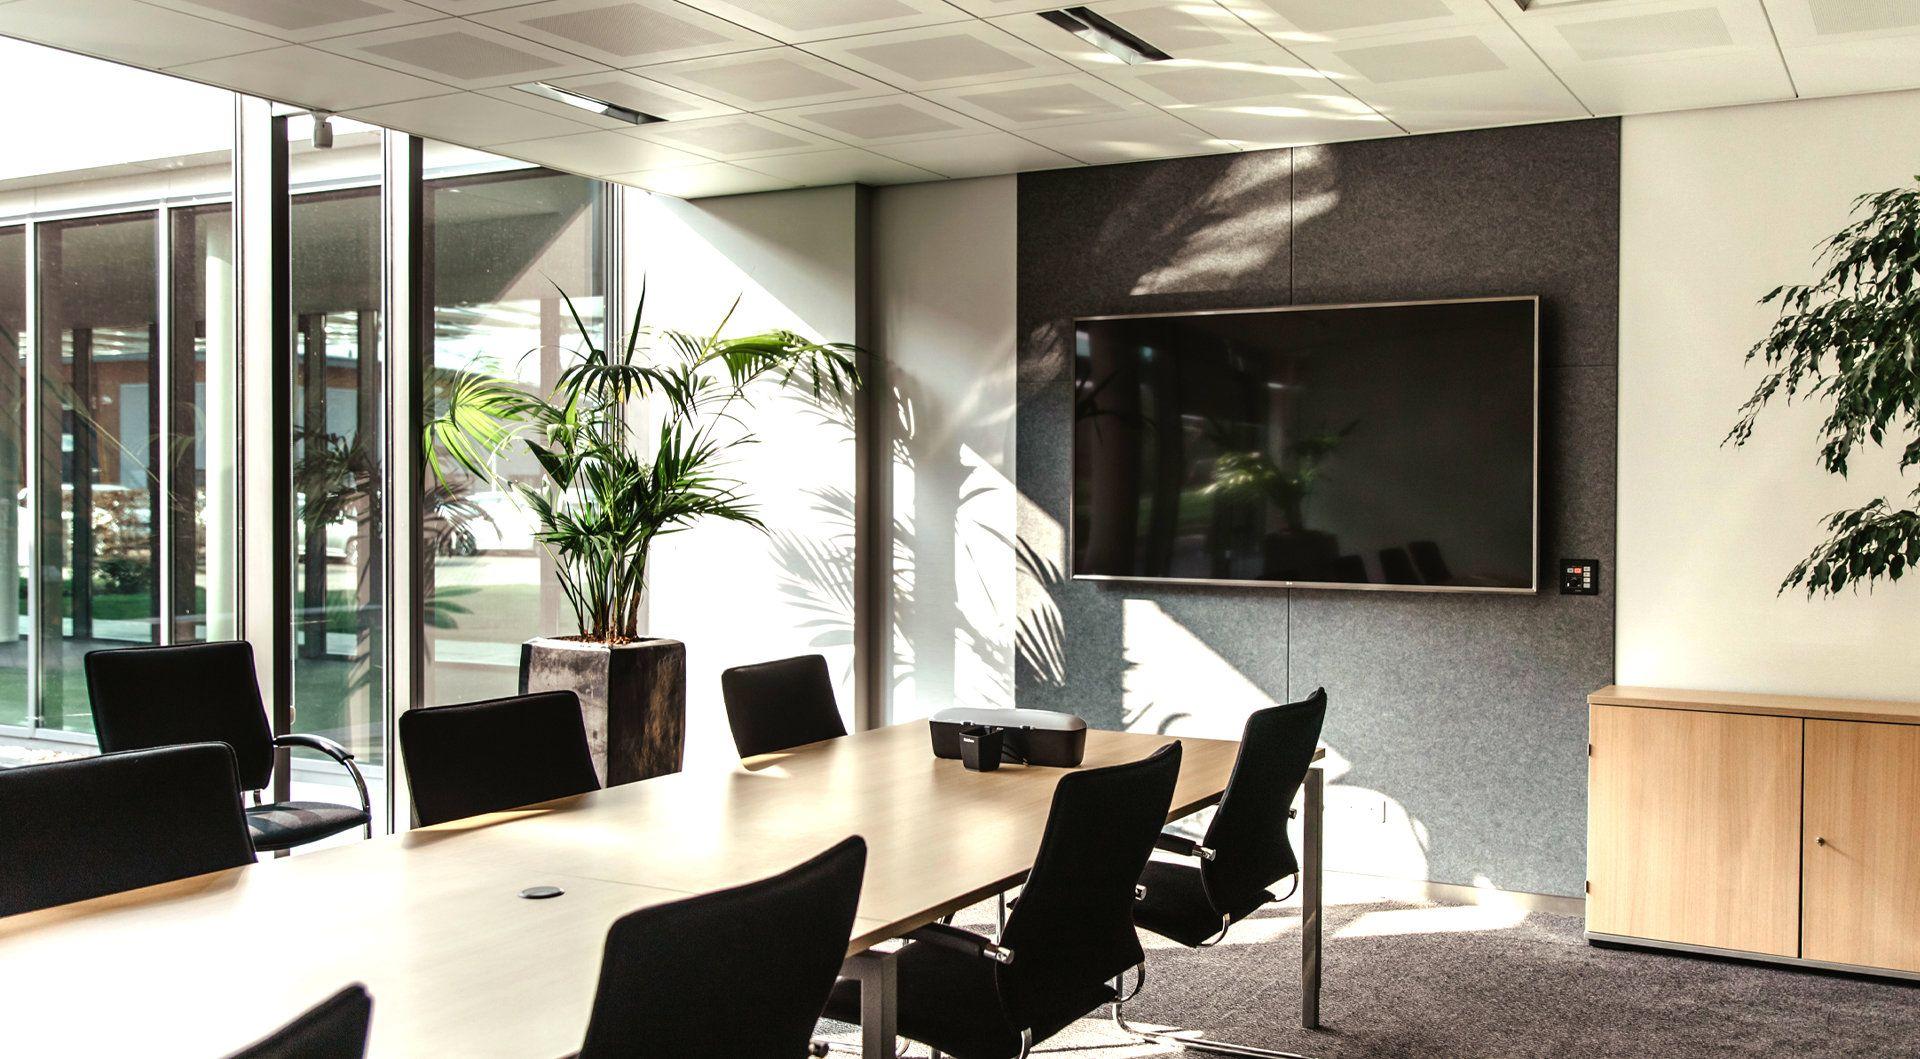 "LG 49VL5F 124,5 cm (49"") LED Full HD Digitale signage flatscreen Zwart - Case studie de vries"